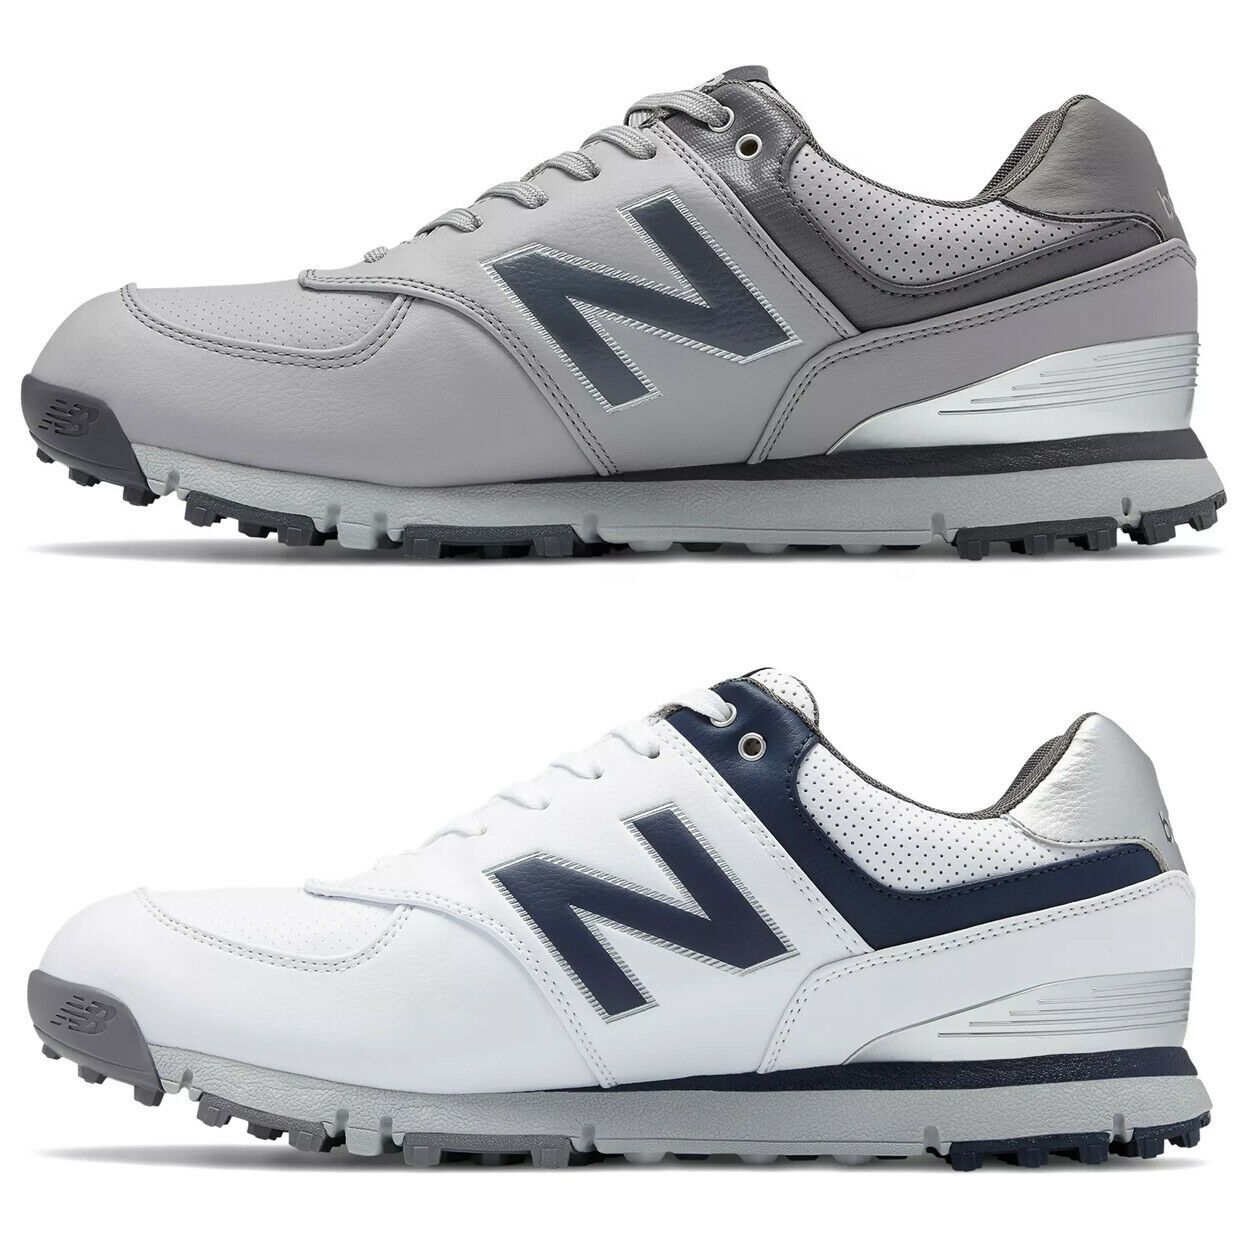 21+ Mens spikeless golf shoes ideas information